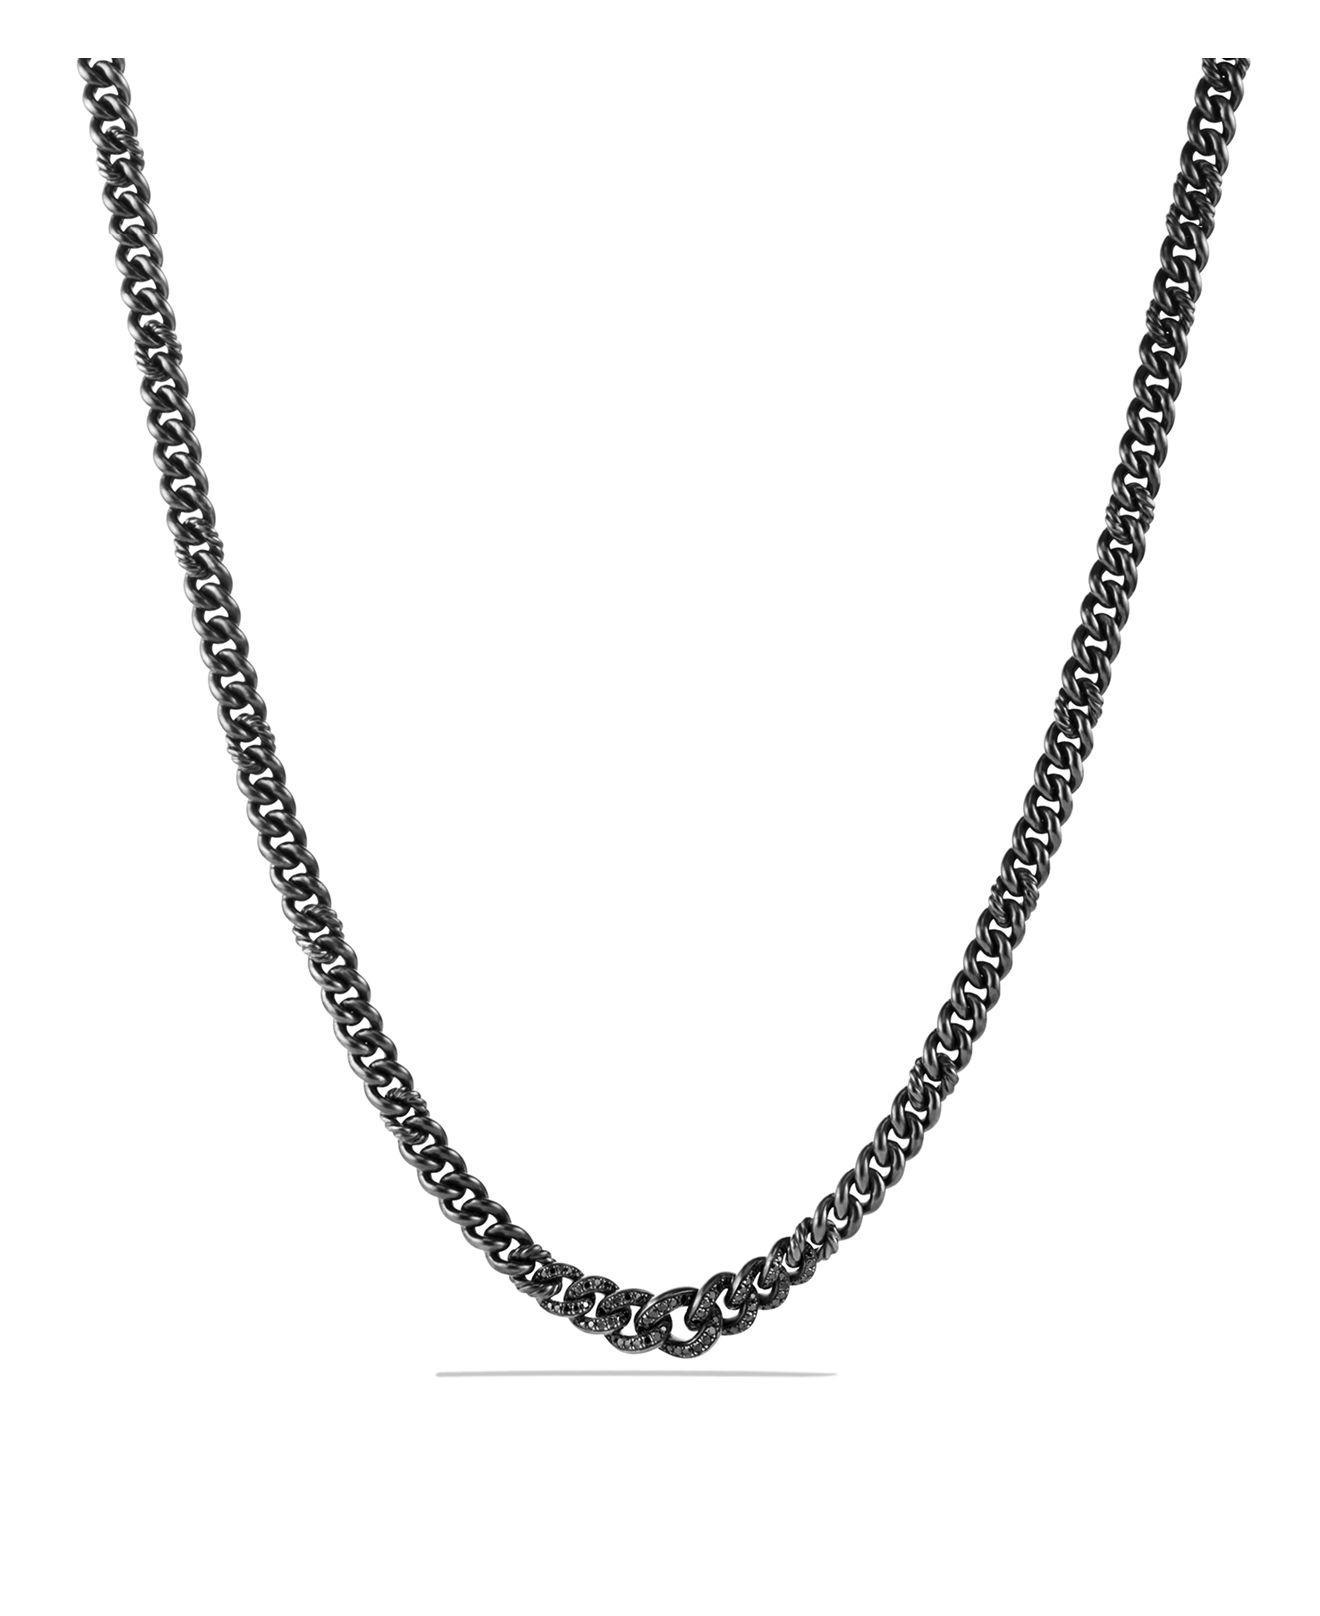 David yurman Petite Pavé Curb Chain Necklace With Black Diamonds